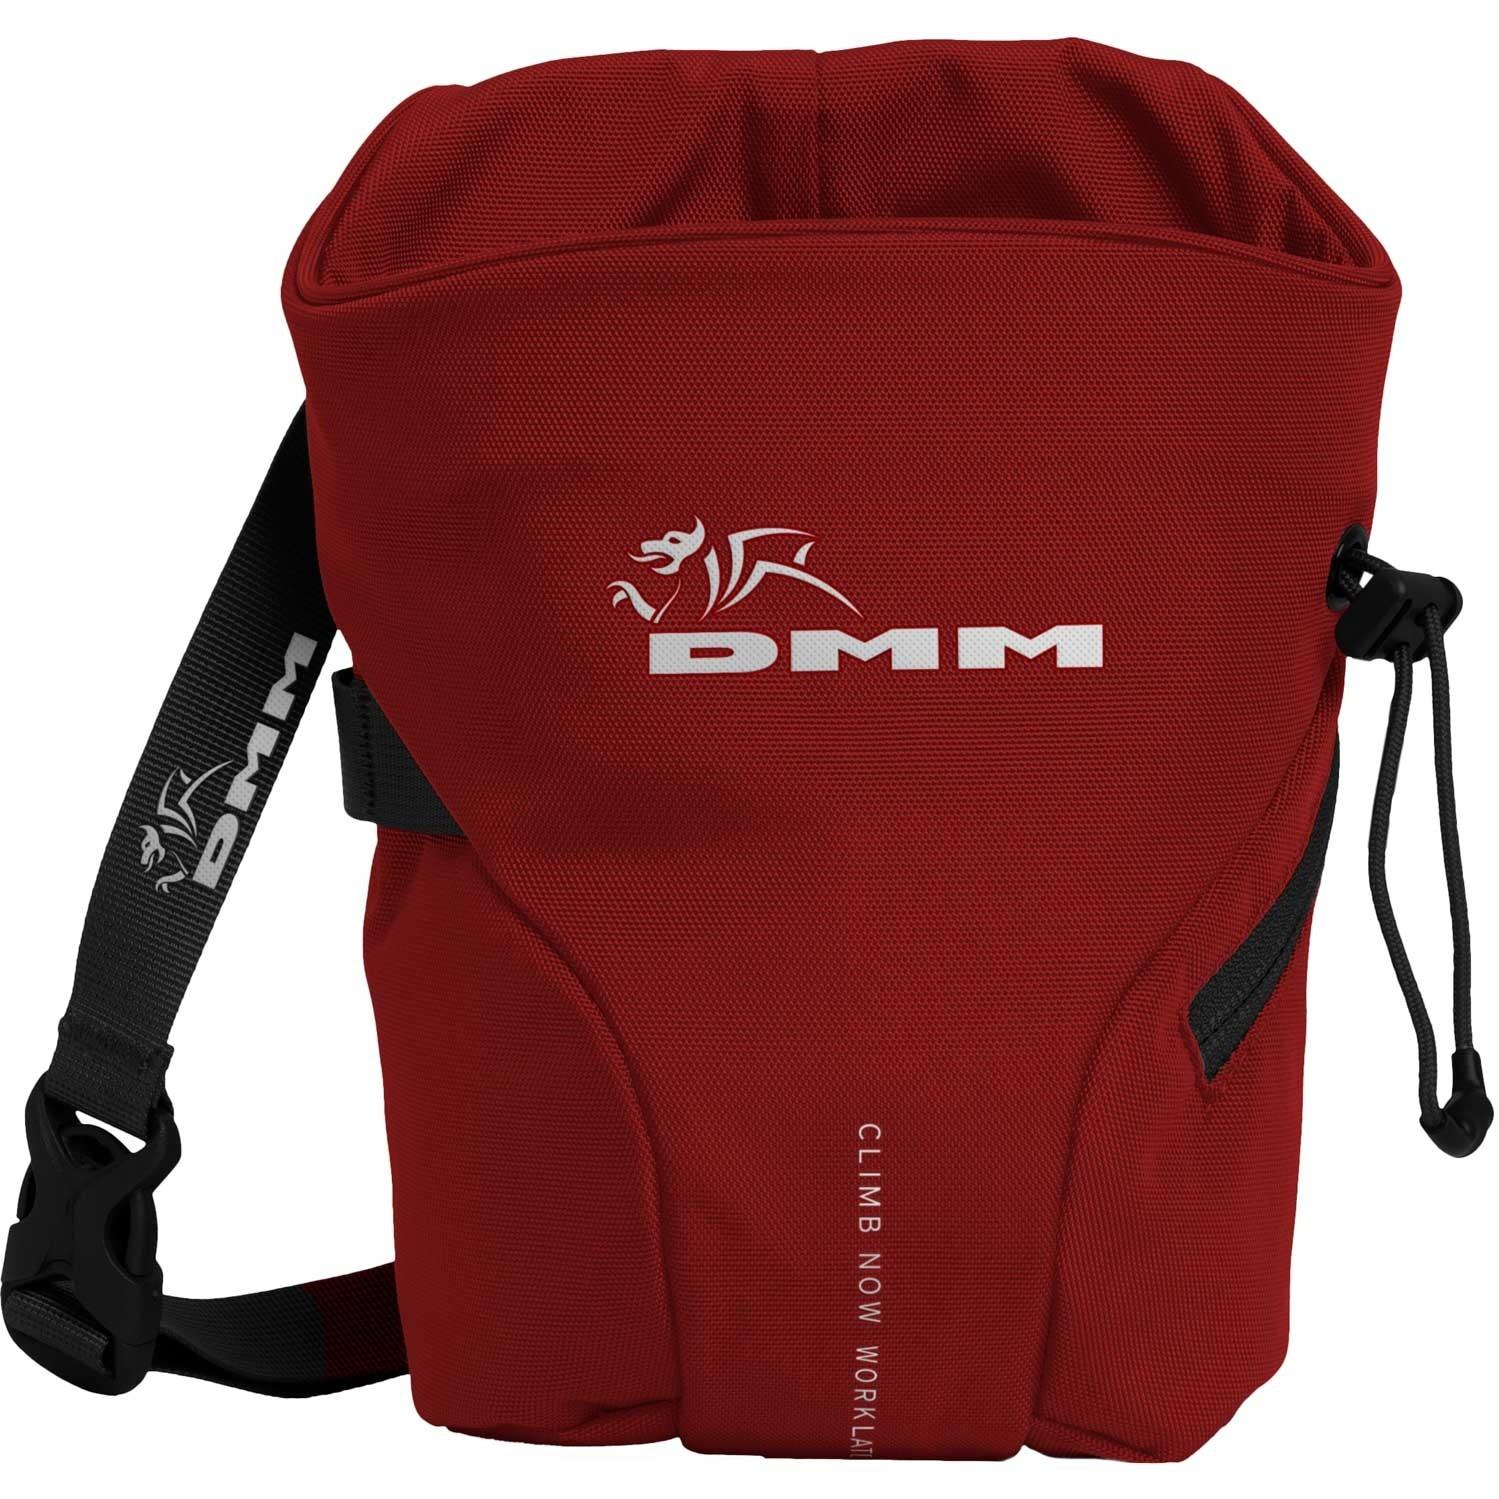 DMM Trad Chalk Bag - Red